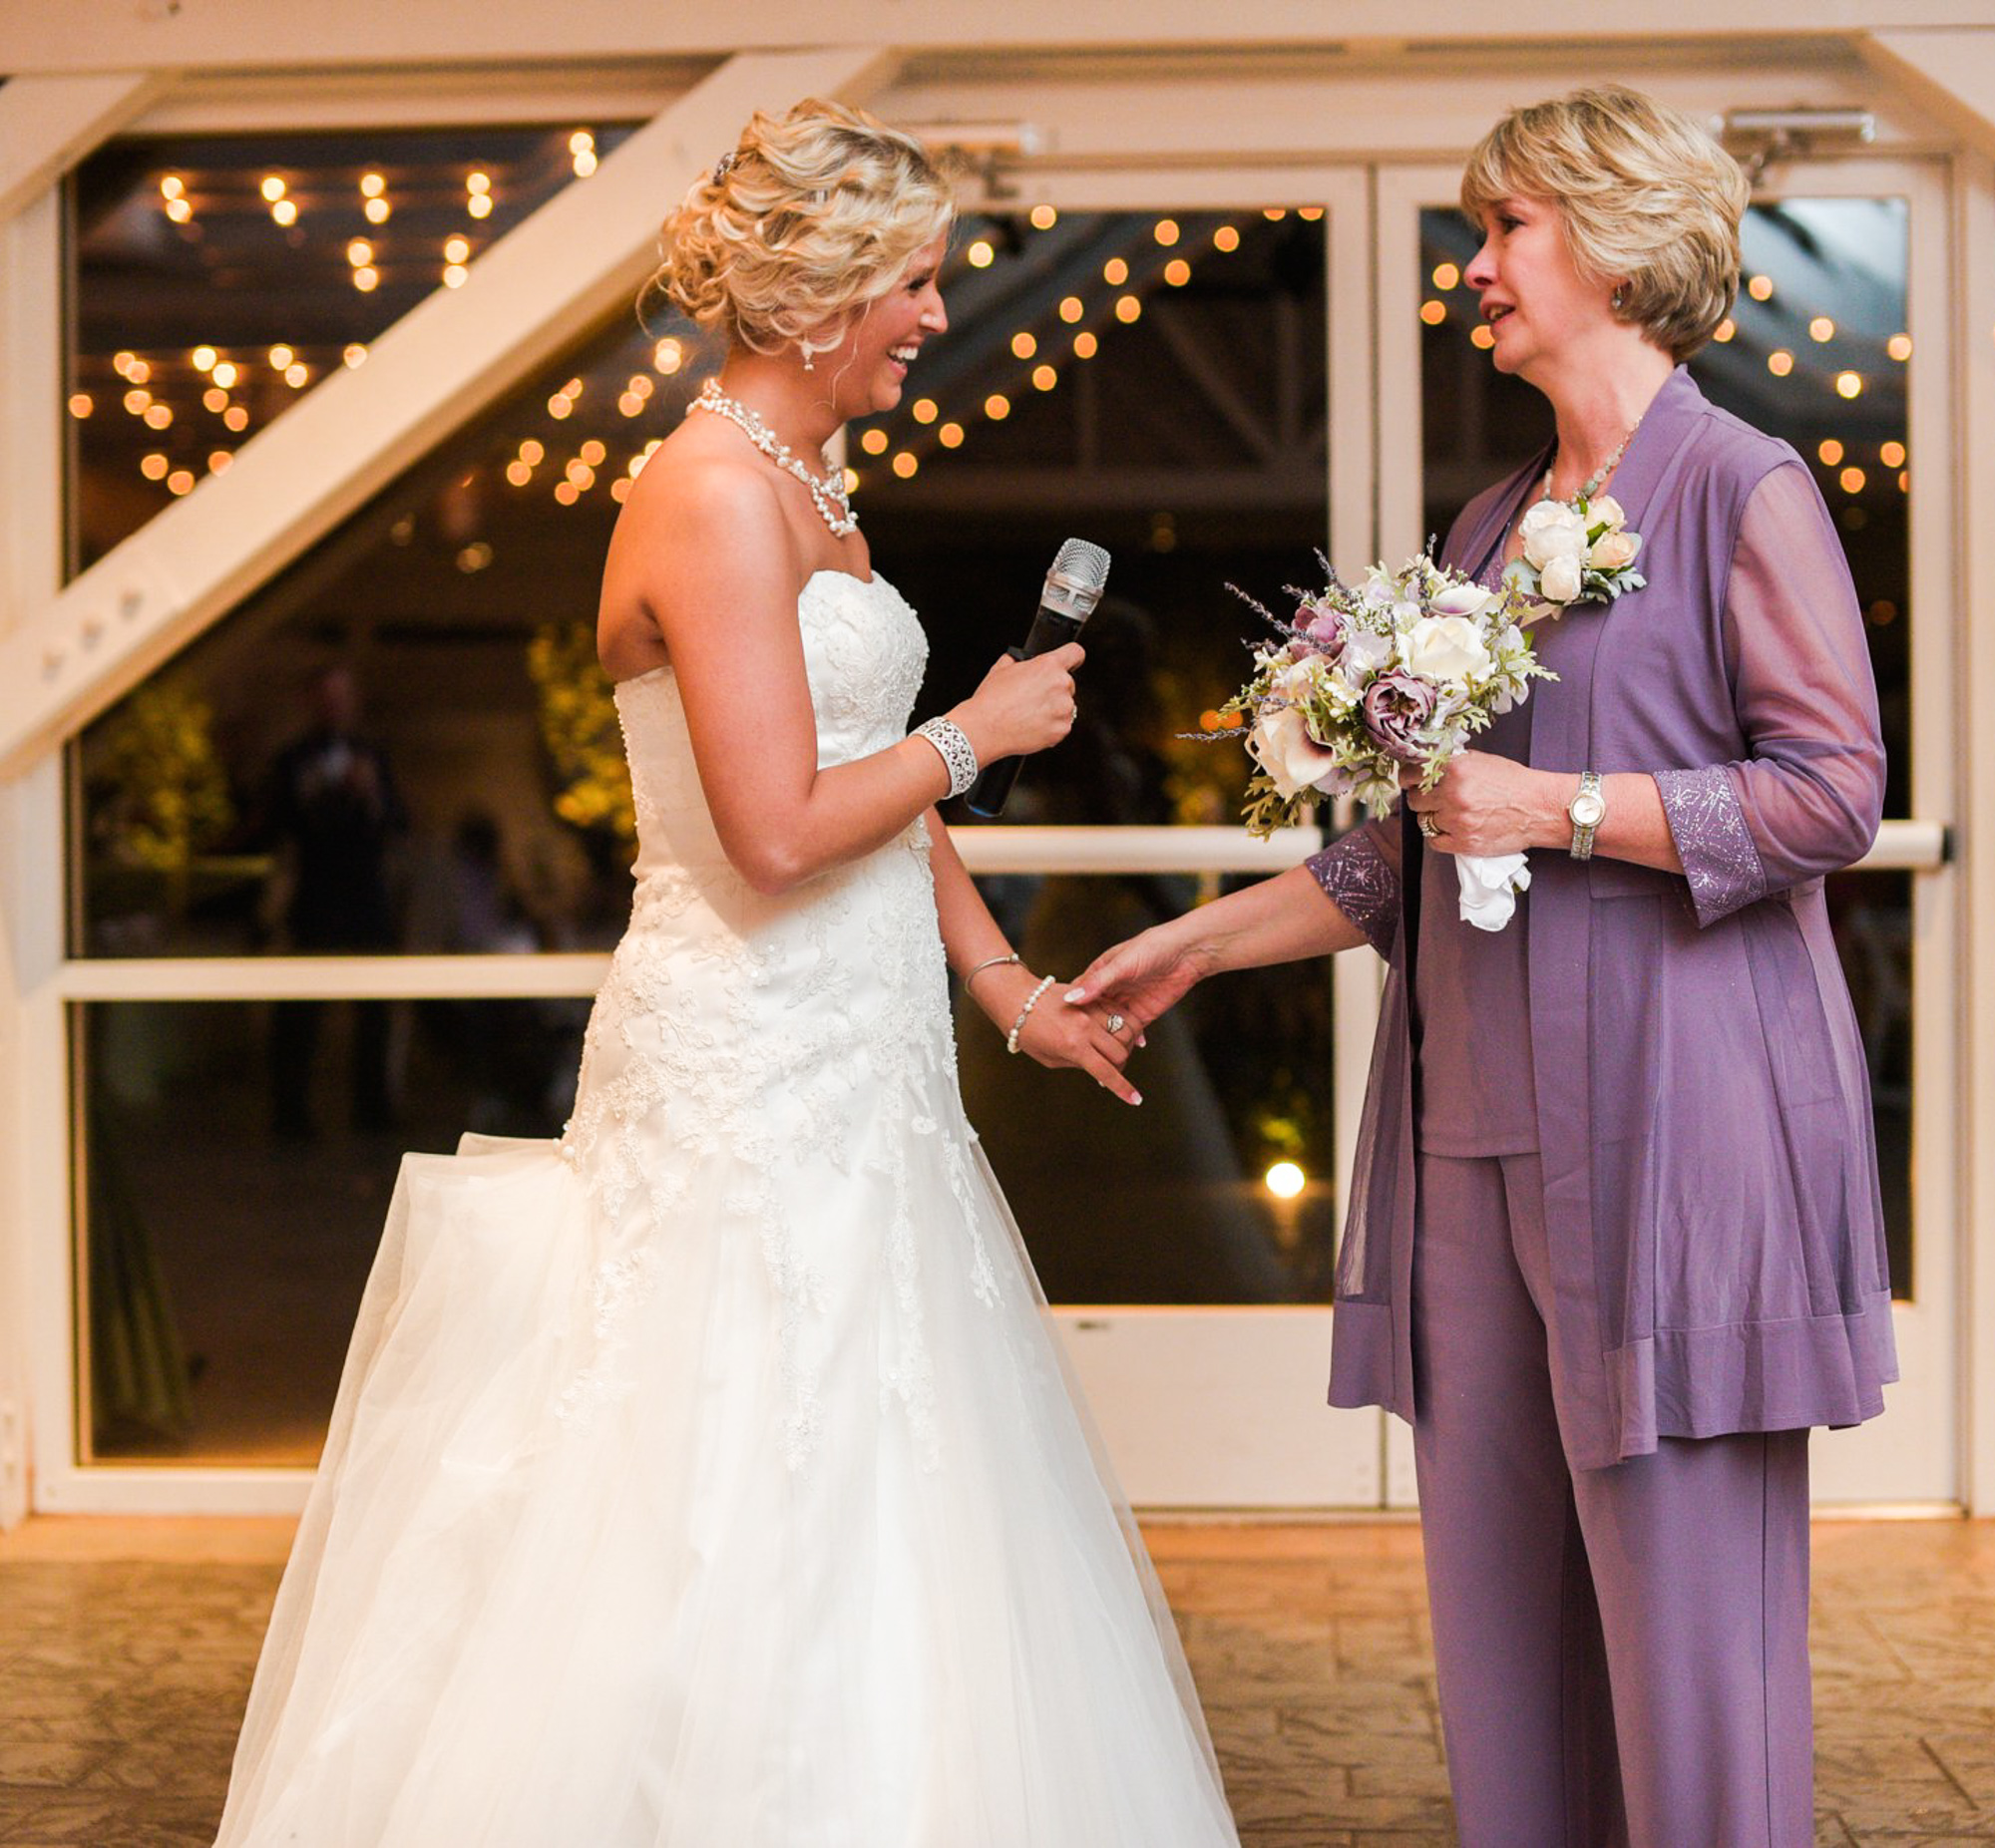 wedding-photography-virginia_0052.jpg